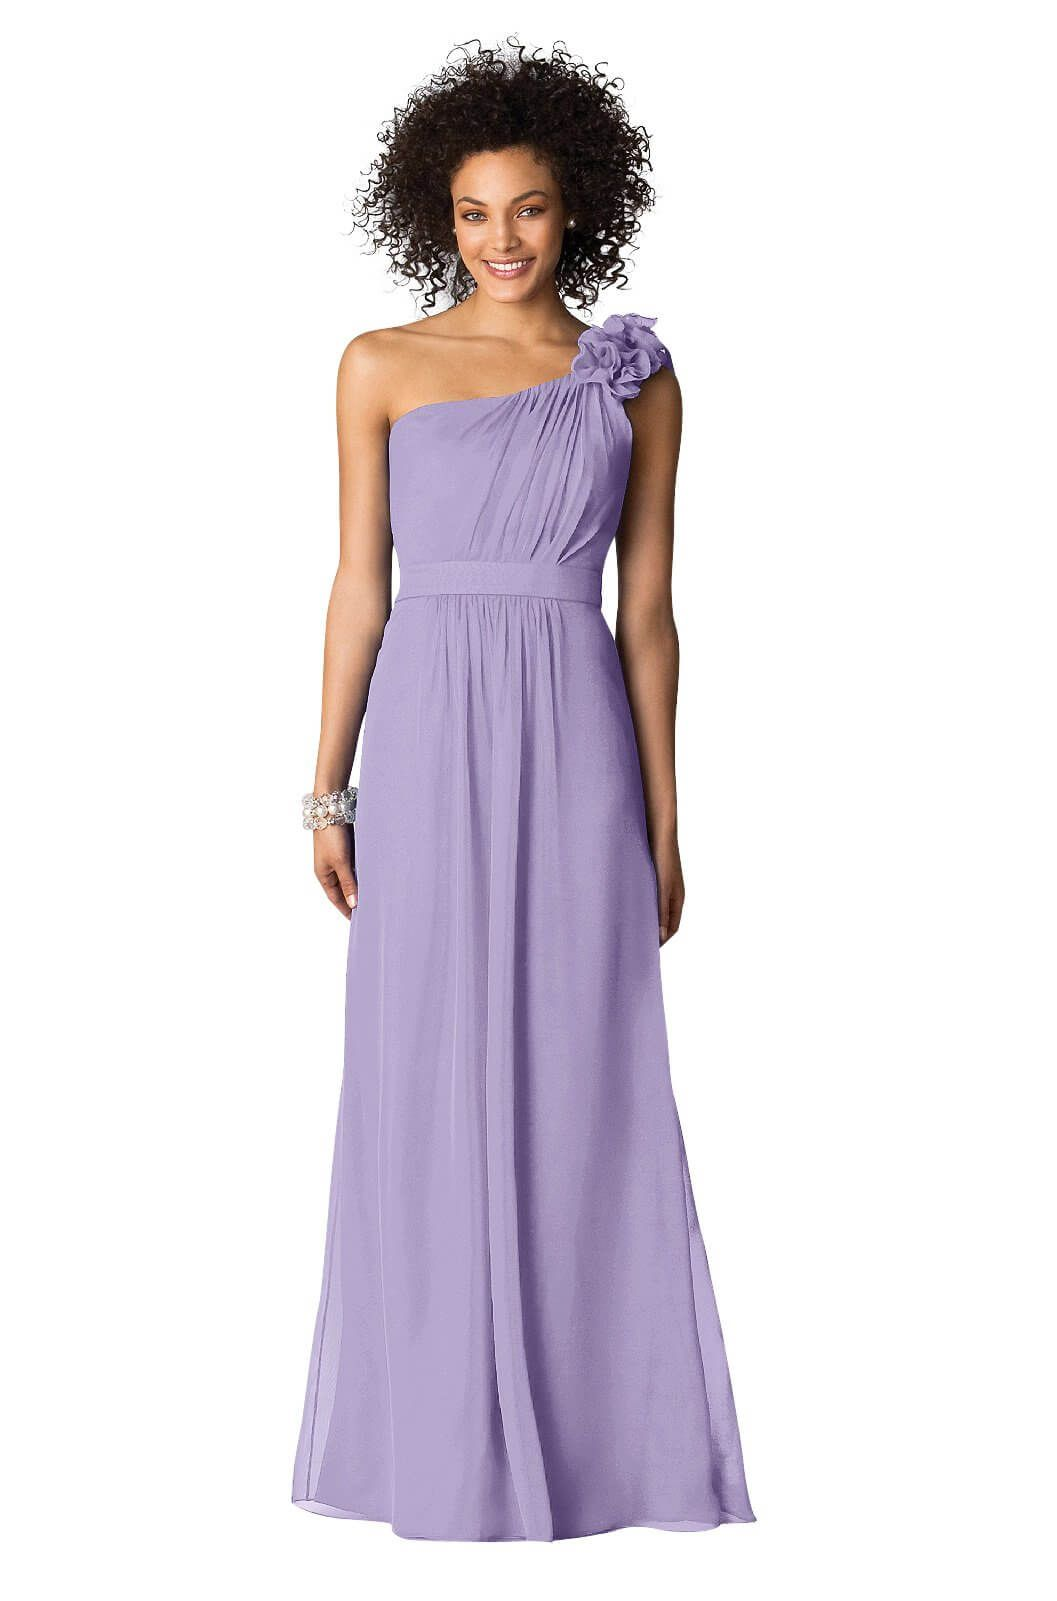 40 Best Picks of Lavender Bridesmaid Dresses   Lavender bridesmaid ...